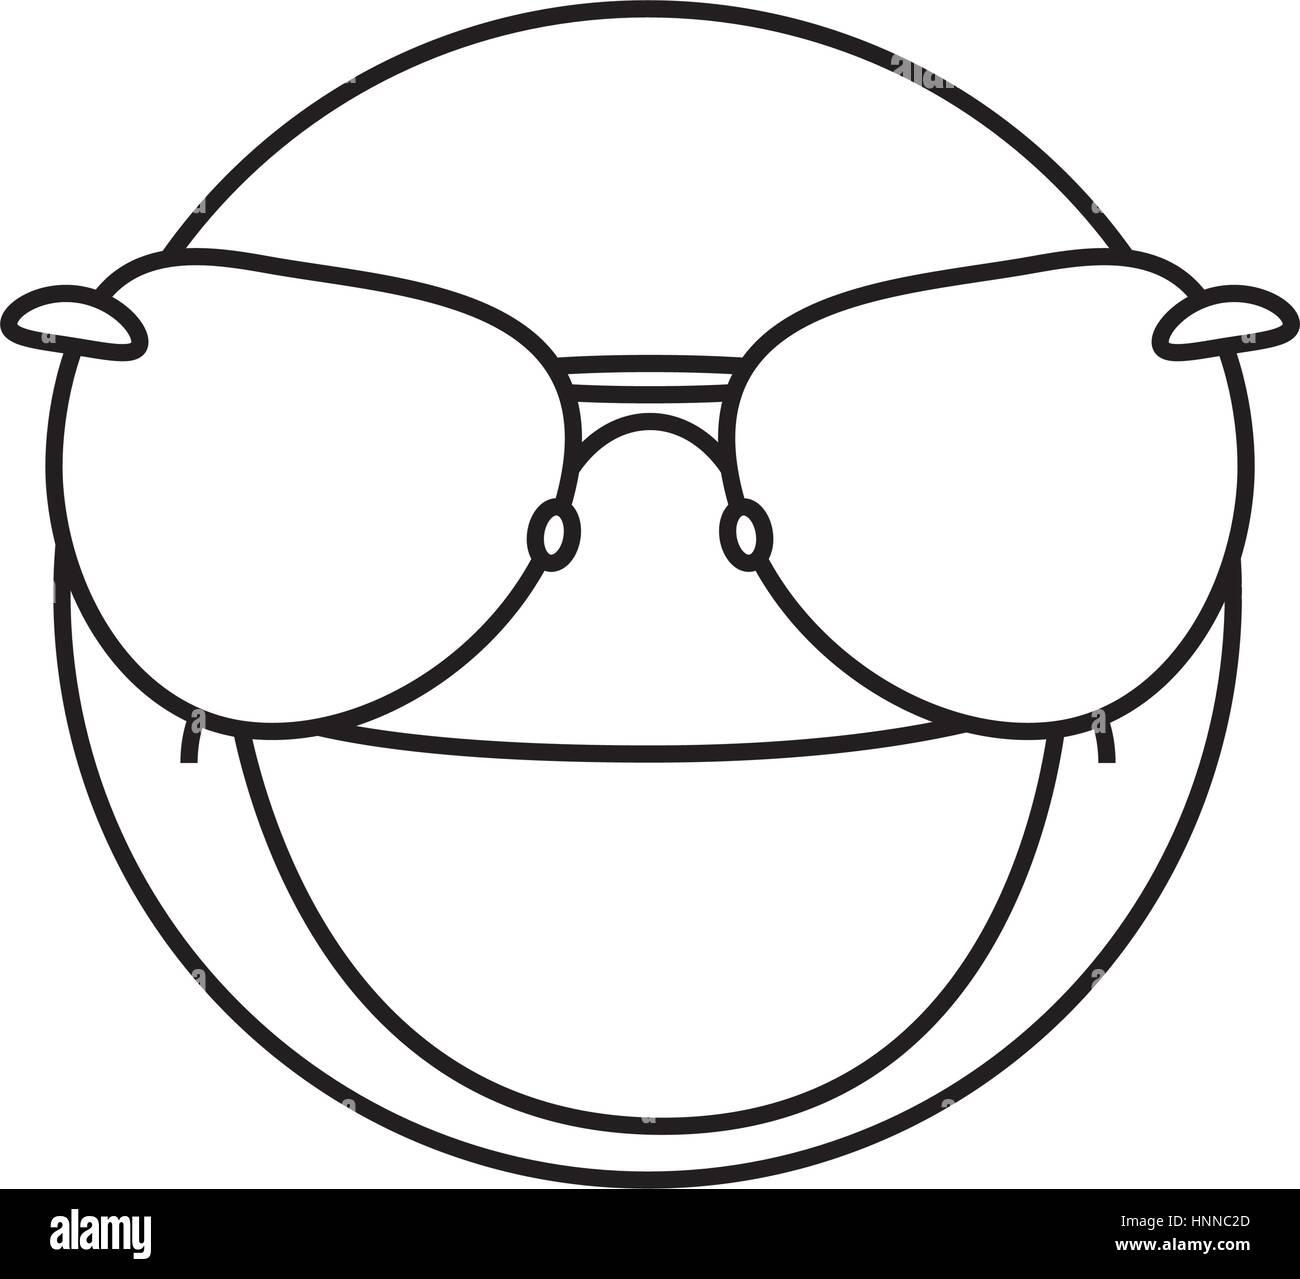 94ae9d30198 Funny emoticon cartoon icon vector illustration graphic design - Stock  Vector